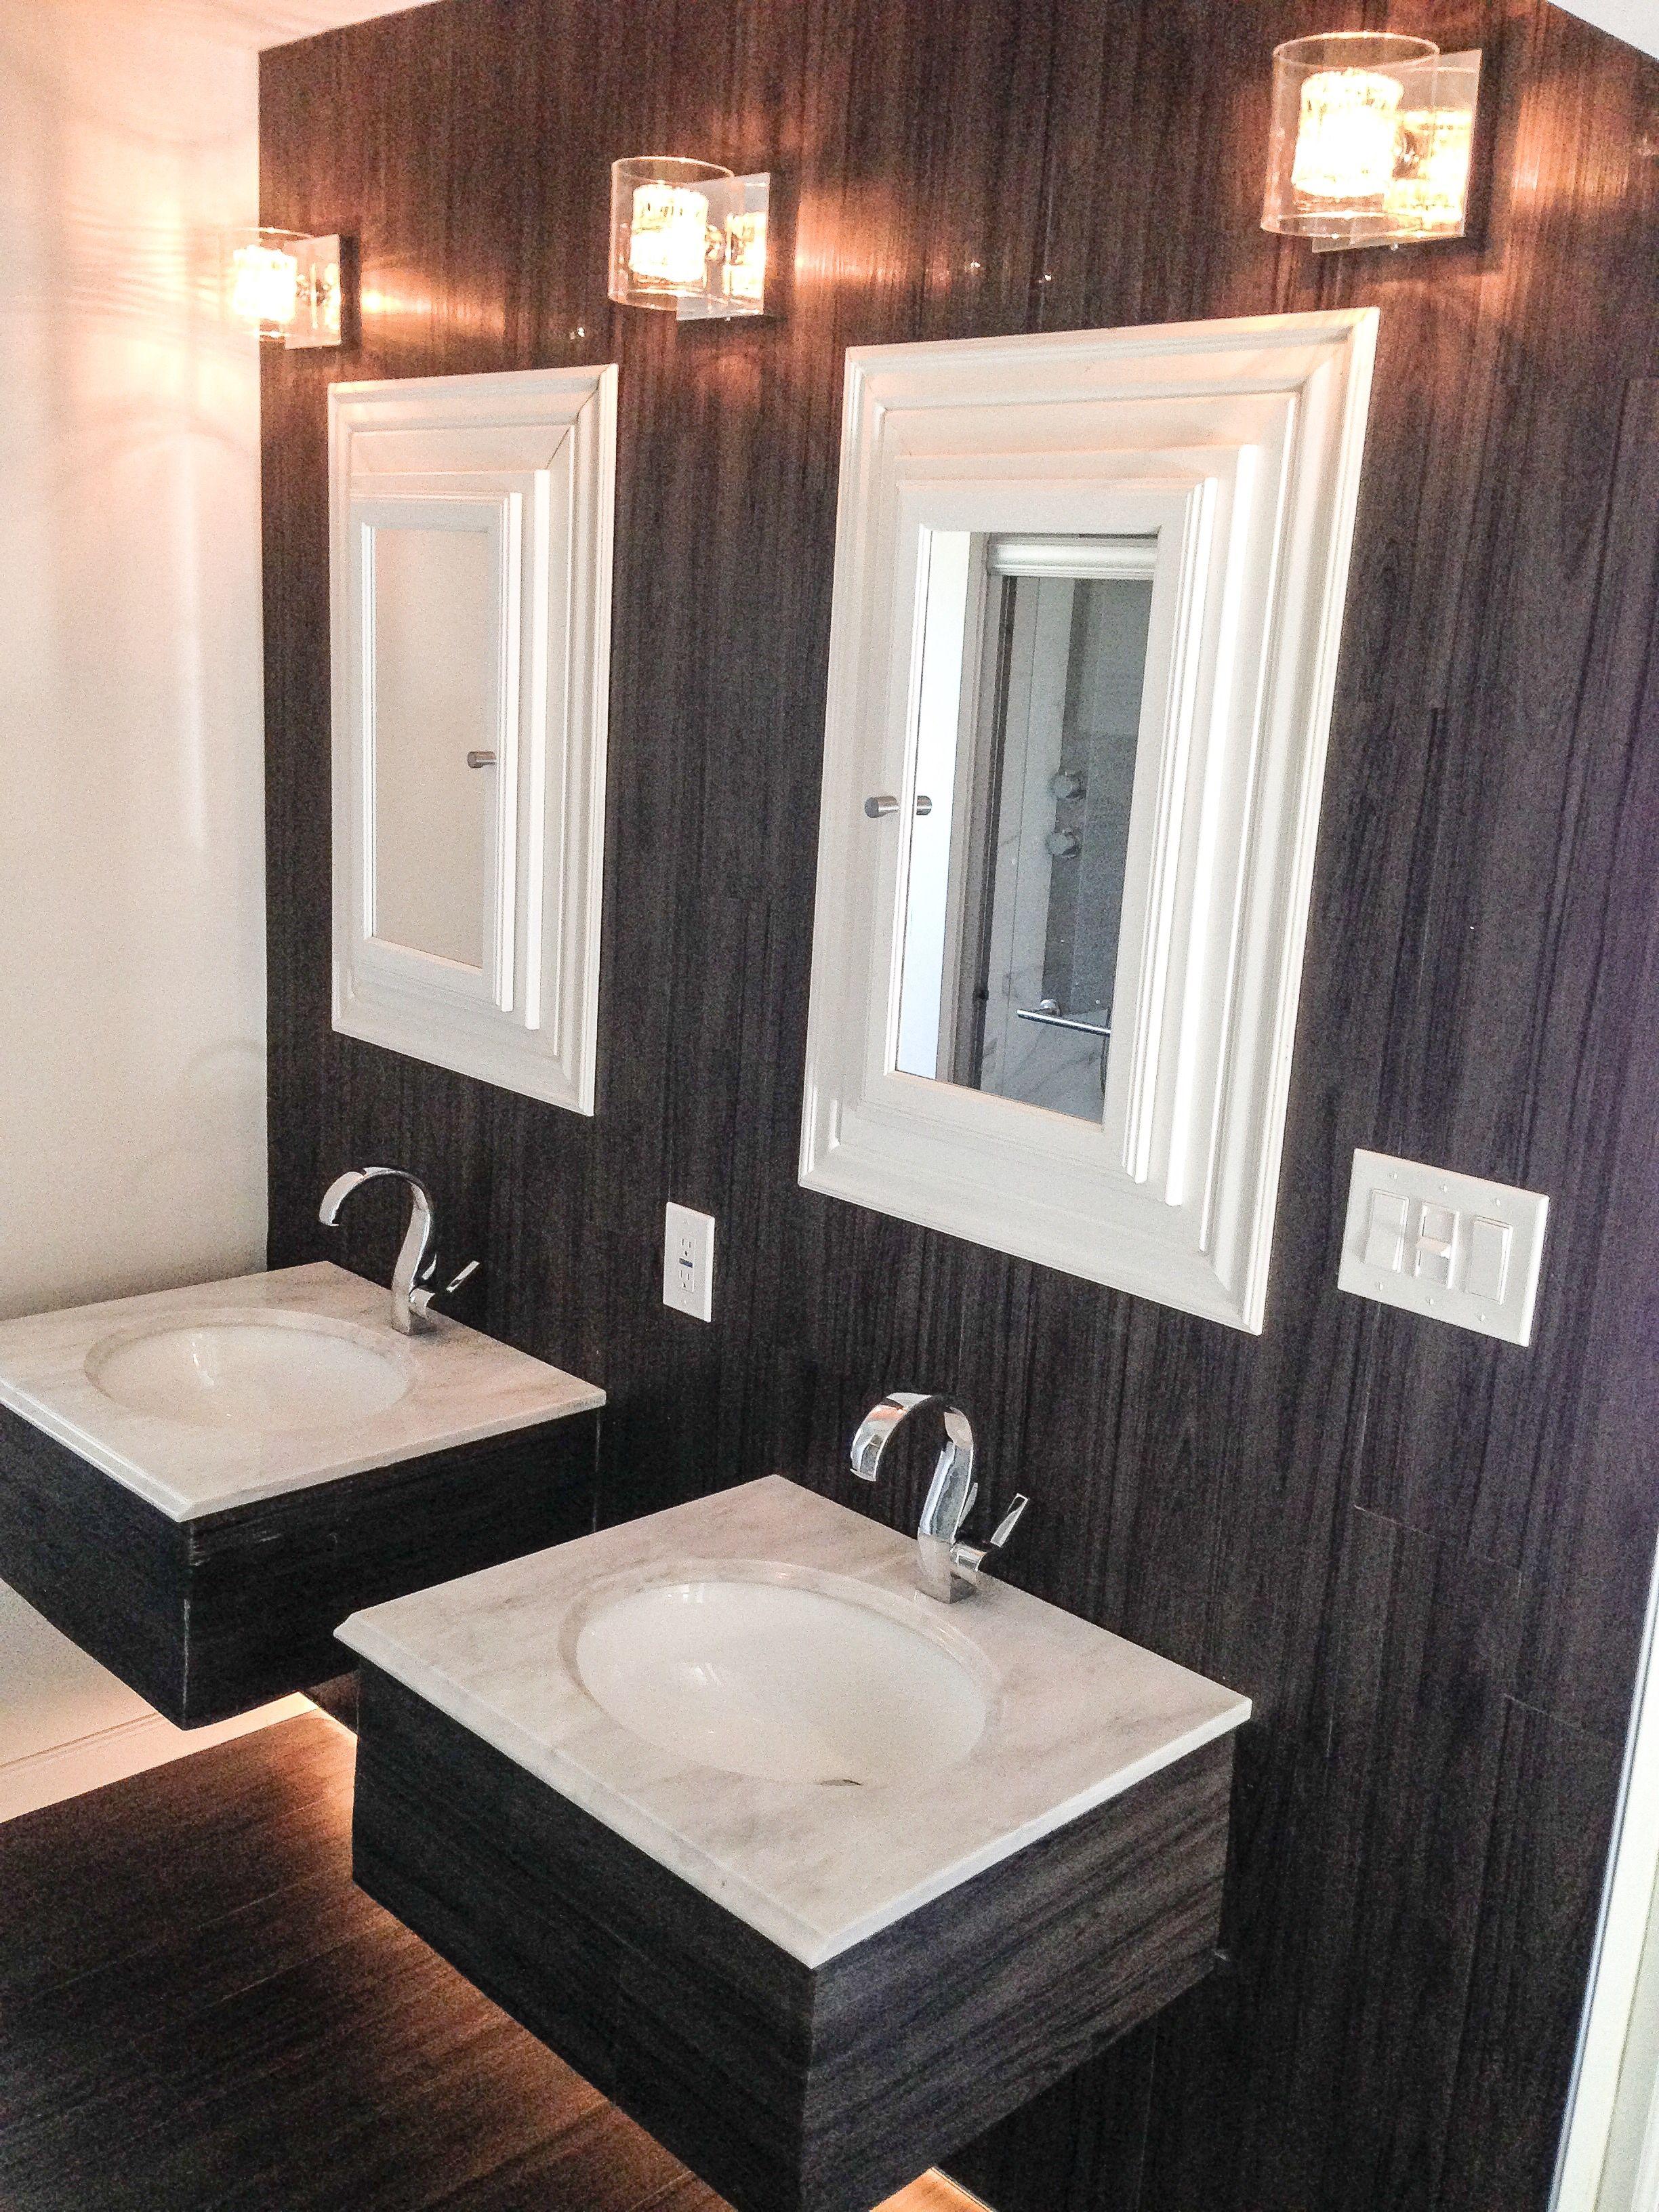 Vinyl plank floor installed on wall bathroom double vanity dark